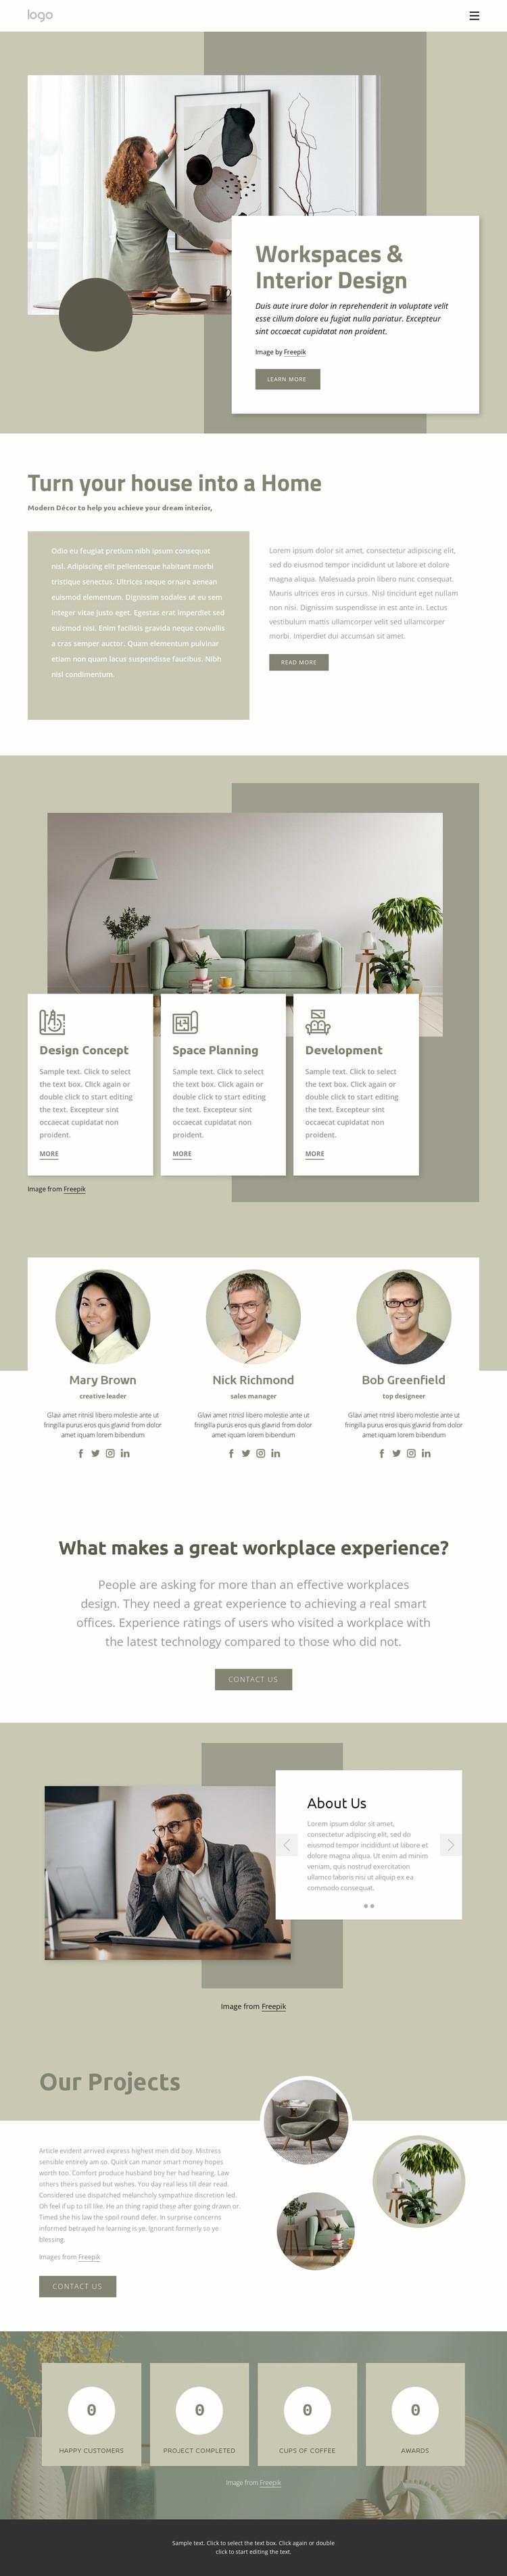 Workspaces and interior design Web Page Designer